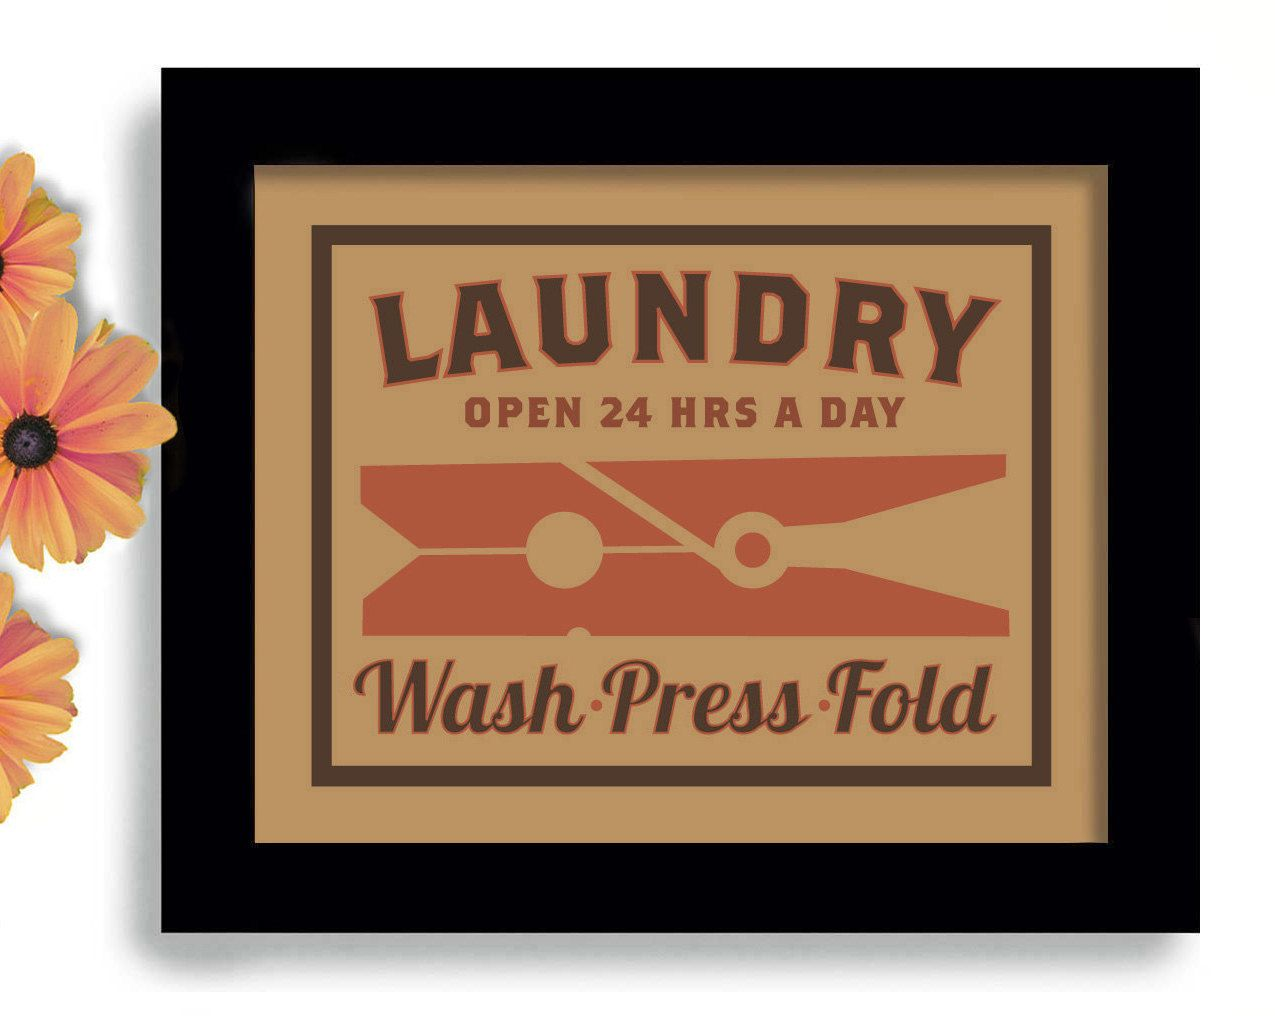 Laundry Room Decor Wall Art Print Kitchen Art Clothespin Laundry Sign. $18.00 via Etsy.  sc 1 st  Pinterest & Laundry Room Decor Wall Art Print Kitchen Art Clothespin Laundry ...